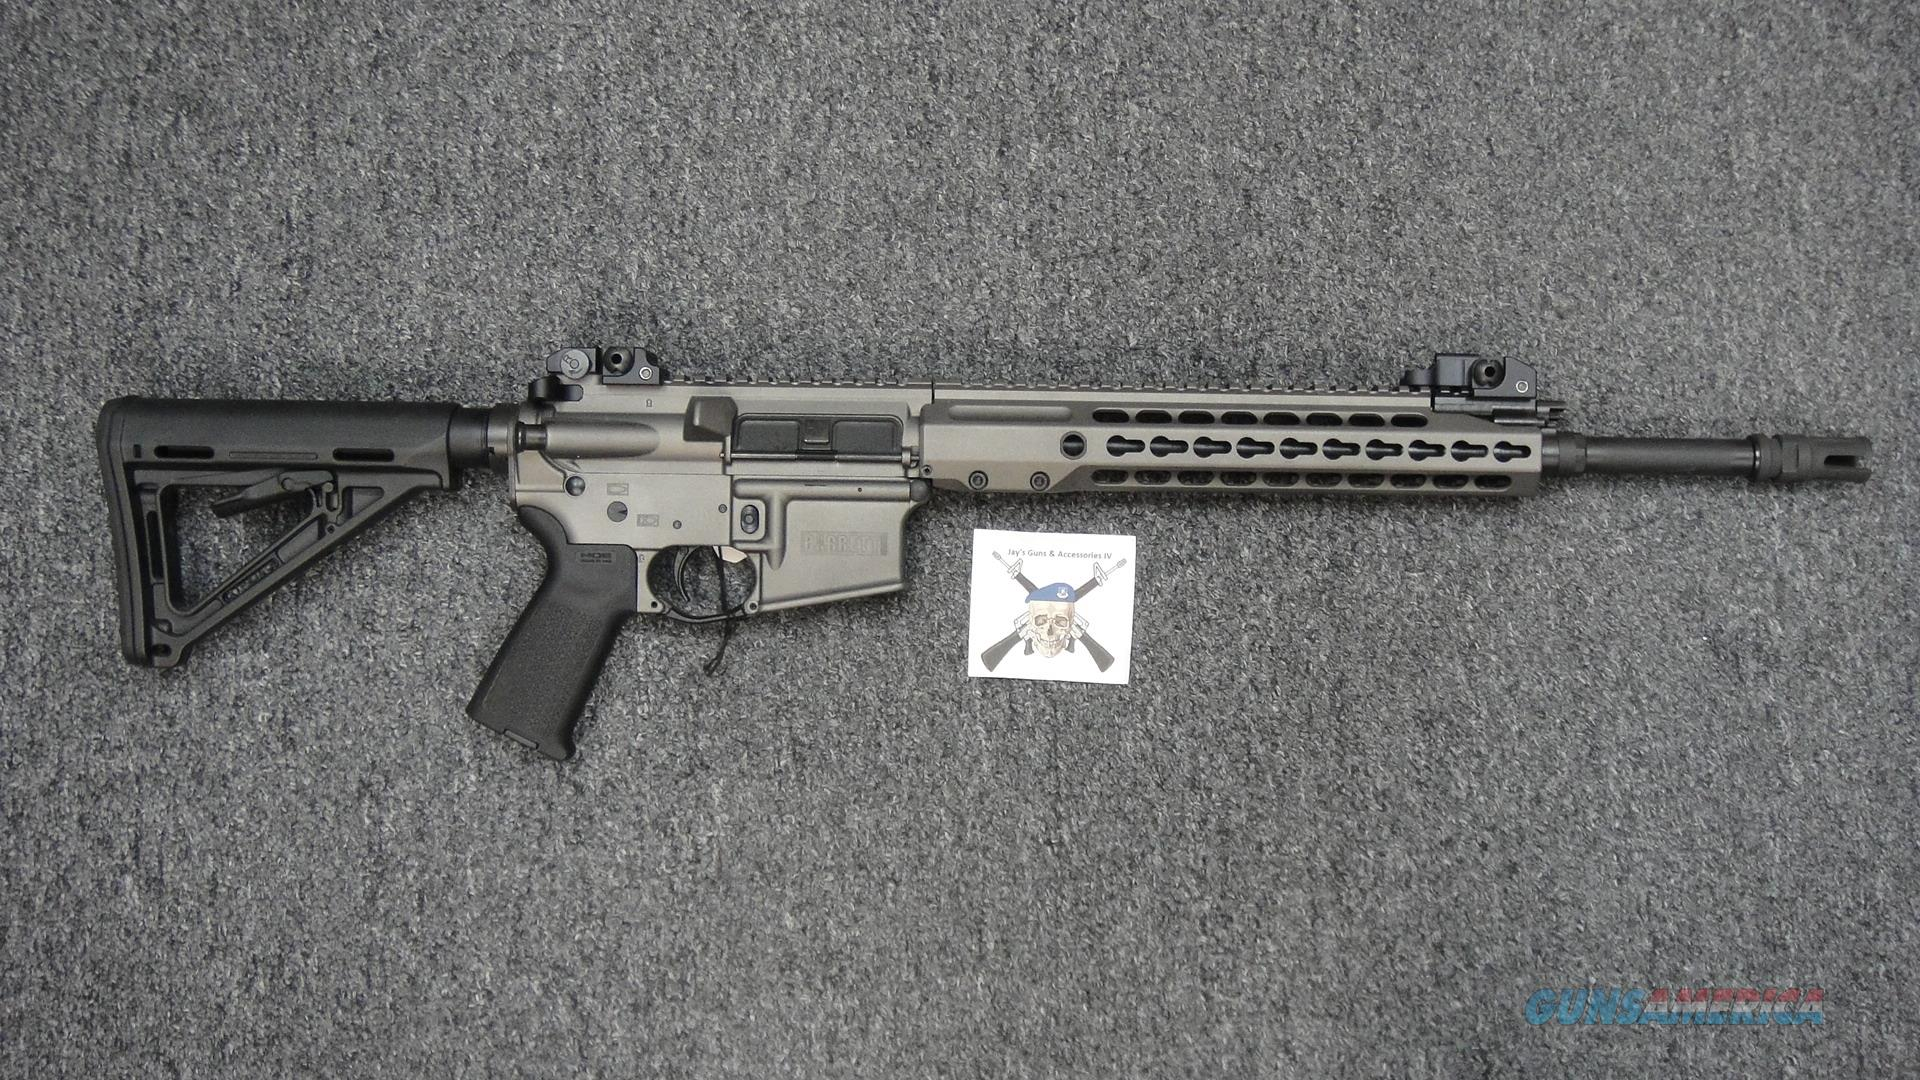 Barrett REC 7 (GEN 2, Gray, 6.8 spc)  Guns > Rifles > Barrett Rifles